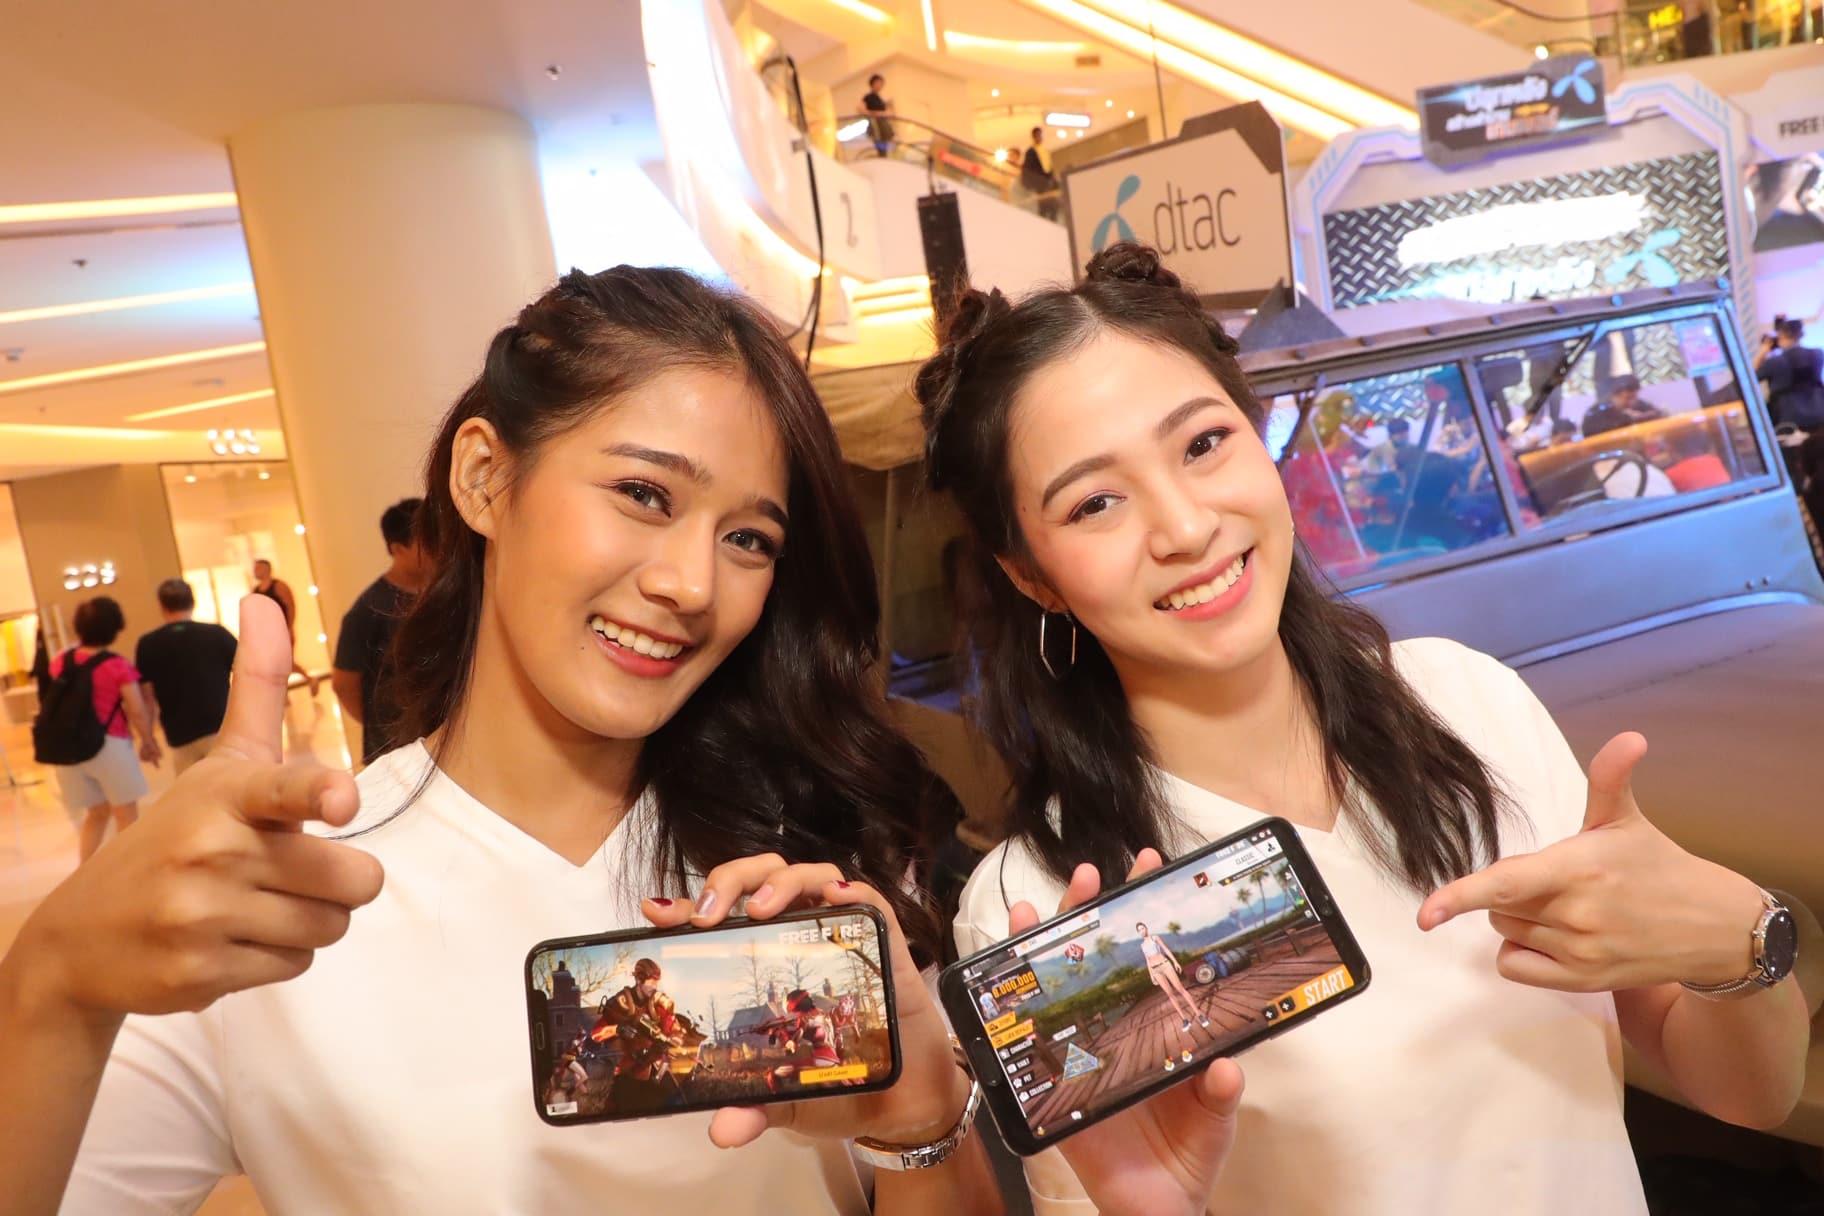 IMG 4694 - ดีแทค จับมือ การีนา จัดแข่งขัน Free Fire Thailand Championship 2019